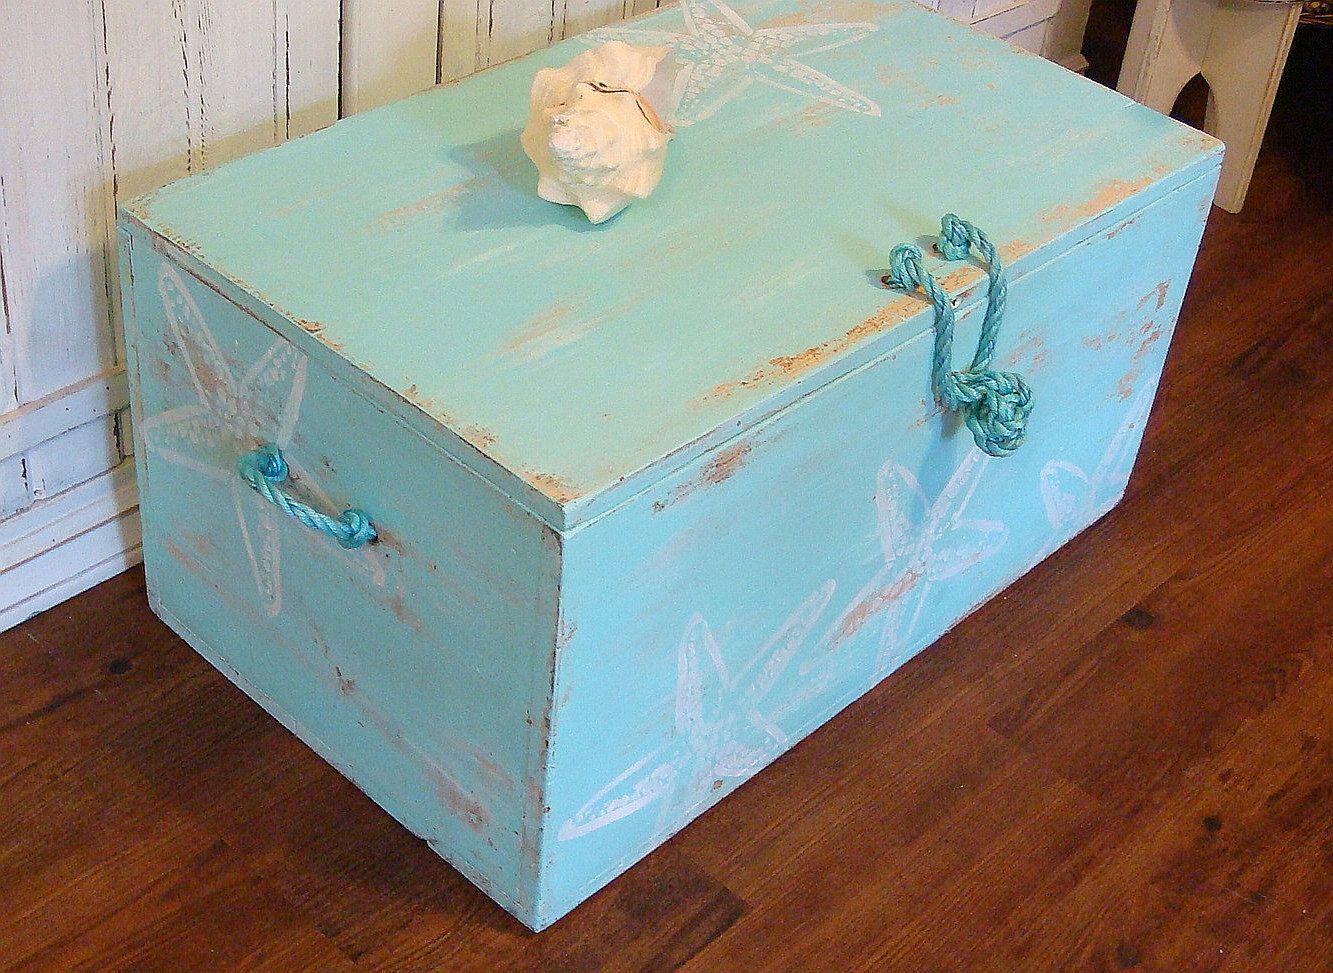 Trunk Blanket Box Starfish Treasure Chest In Seafoam